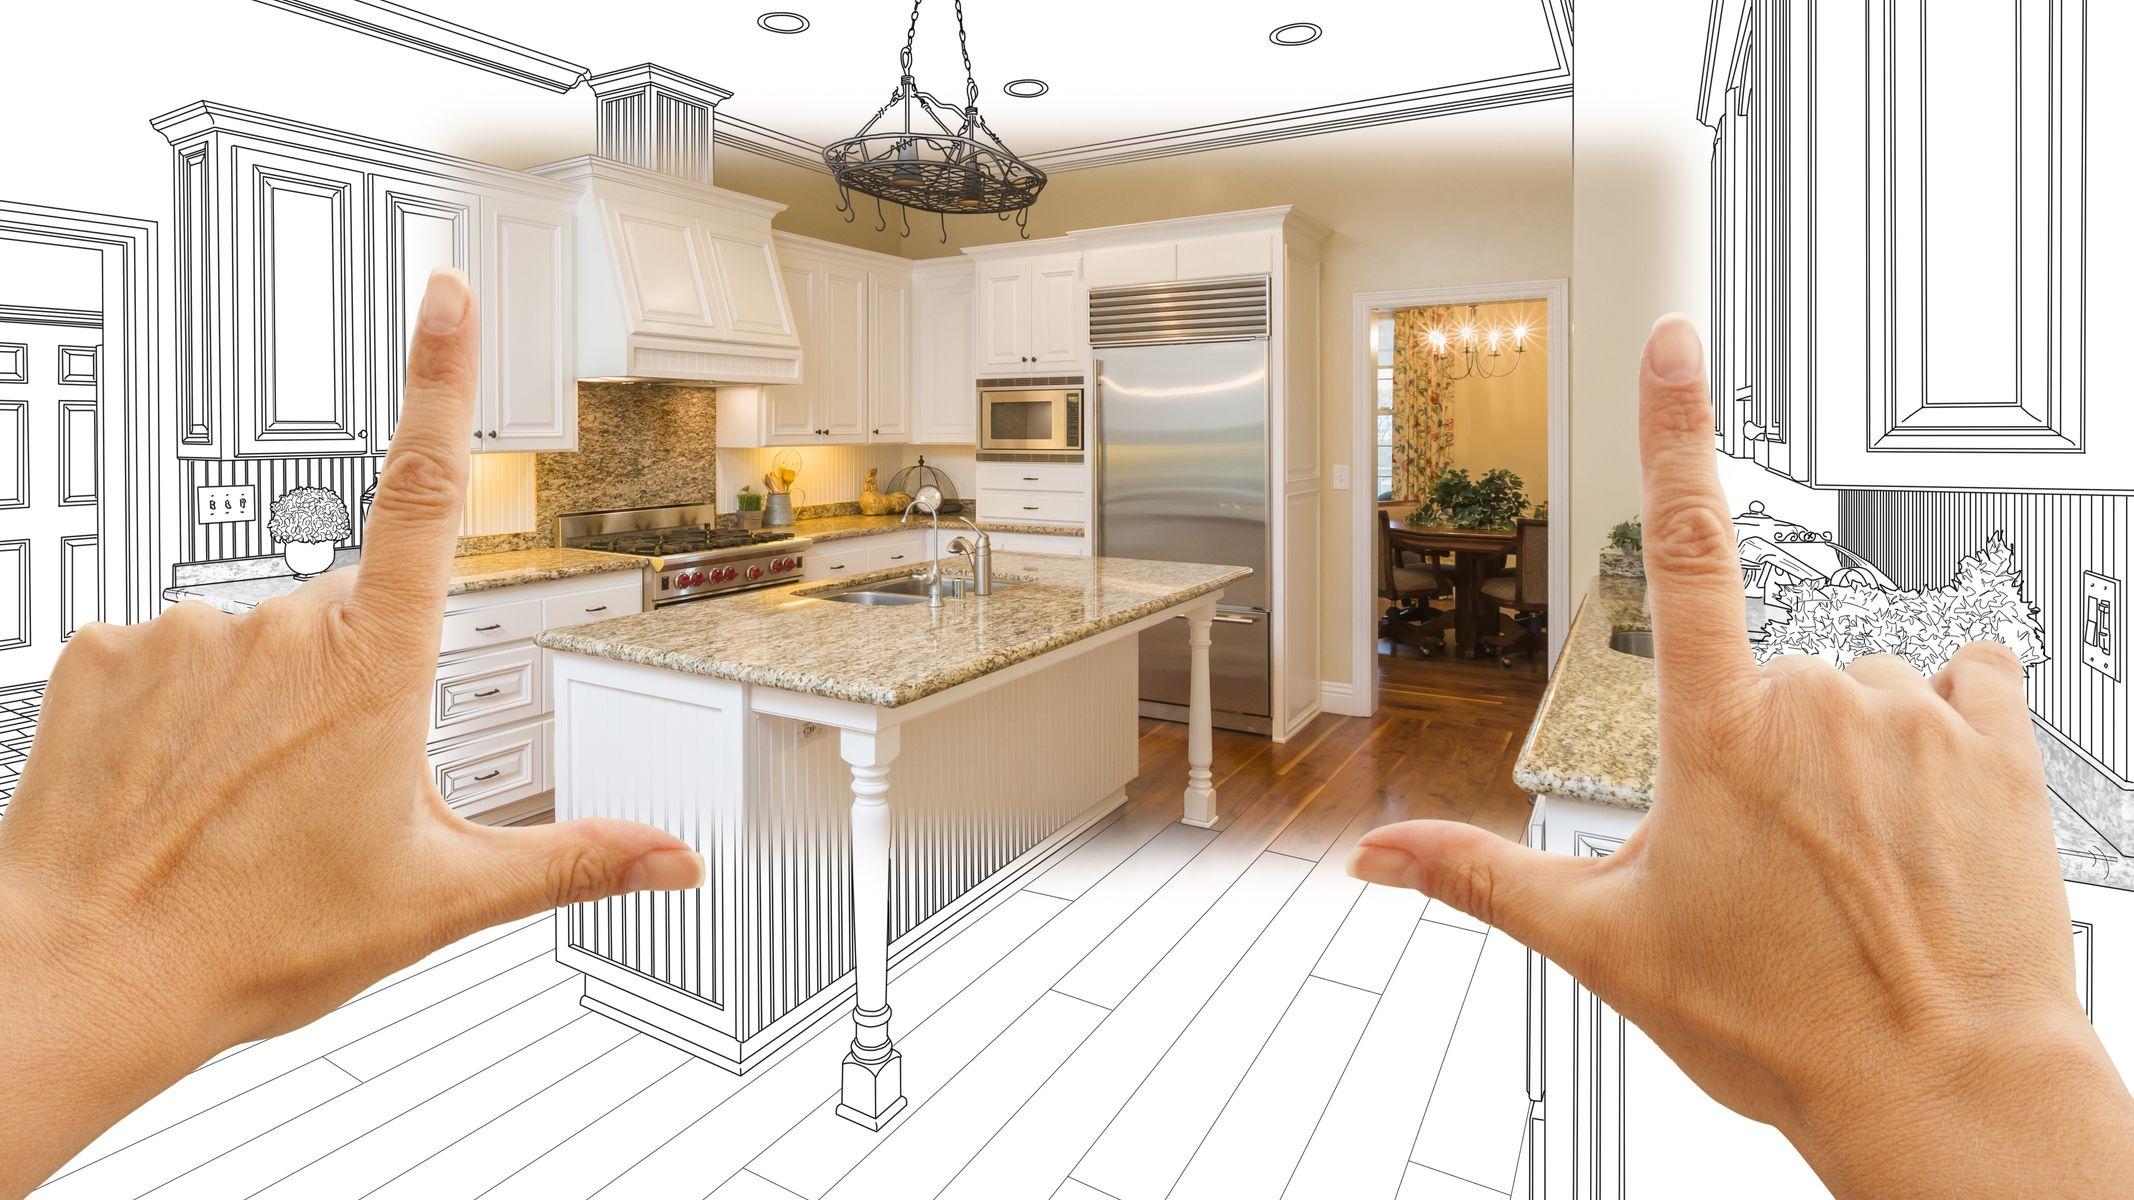 Pin By Rahat Interior On Rahat Interior Design Custom Kitchens Design Home Renovation Top Interior Designers